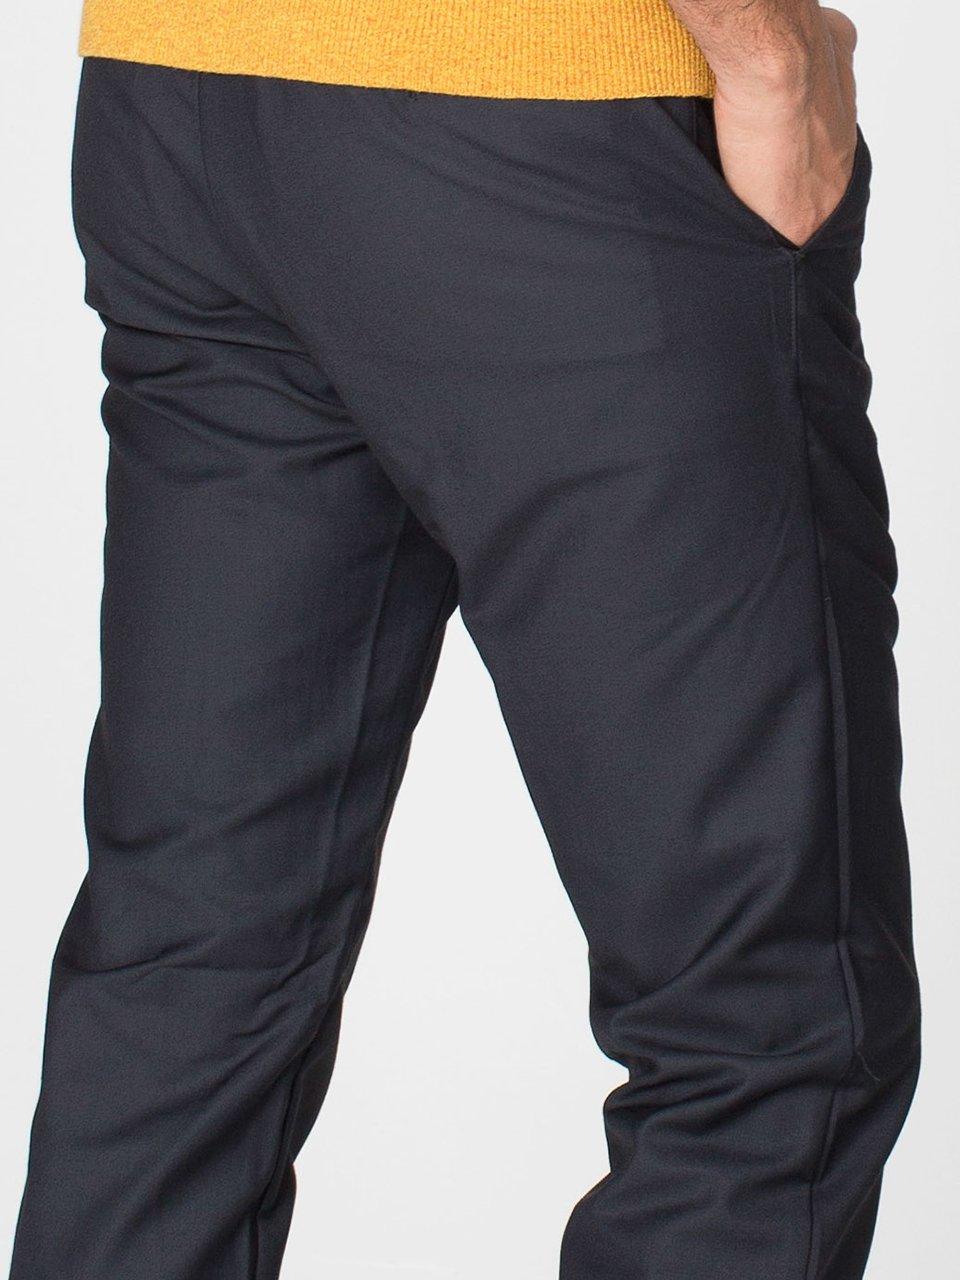 Viscose Twill Welt Pocket Pant